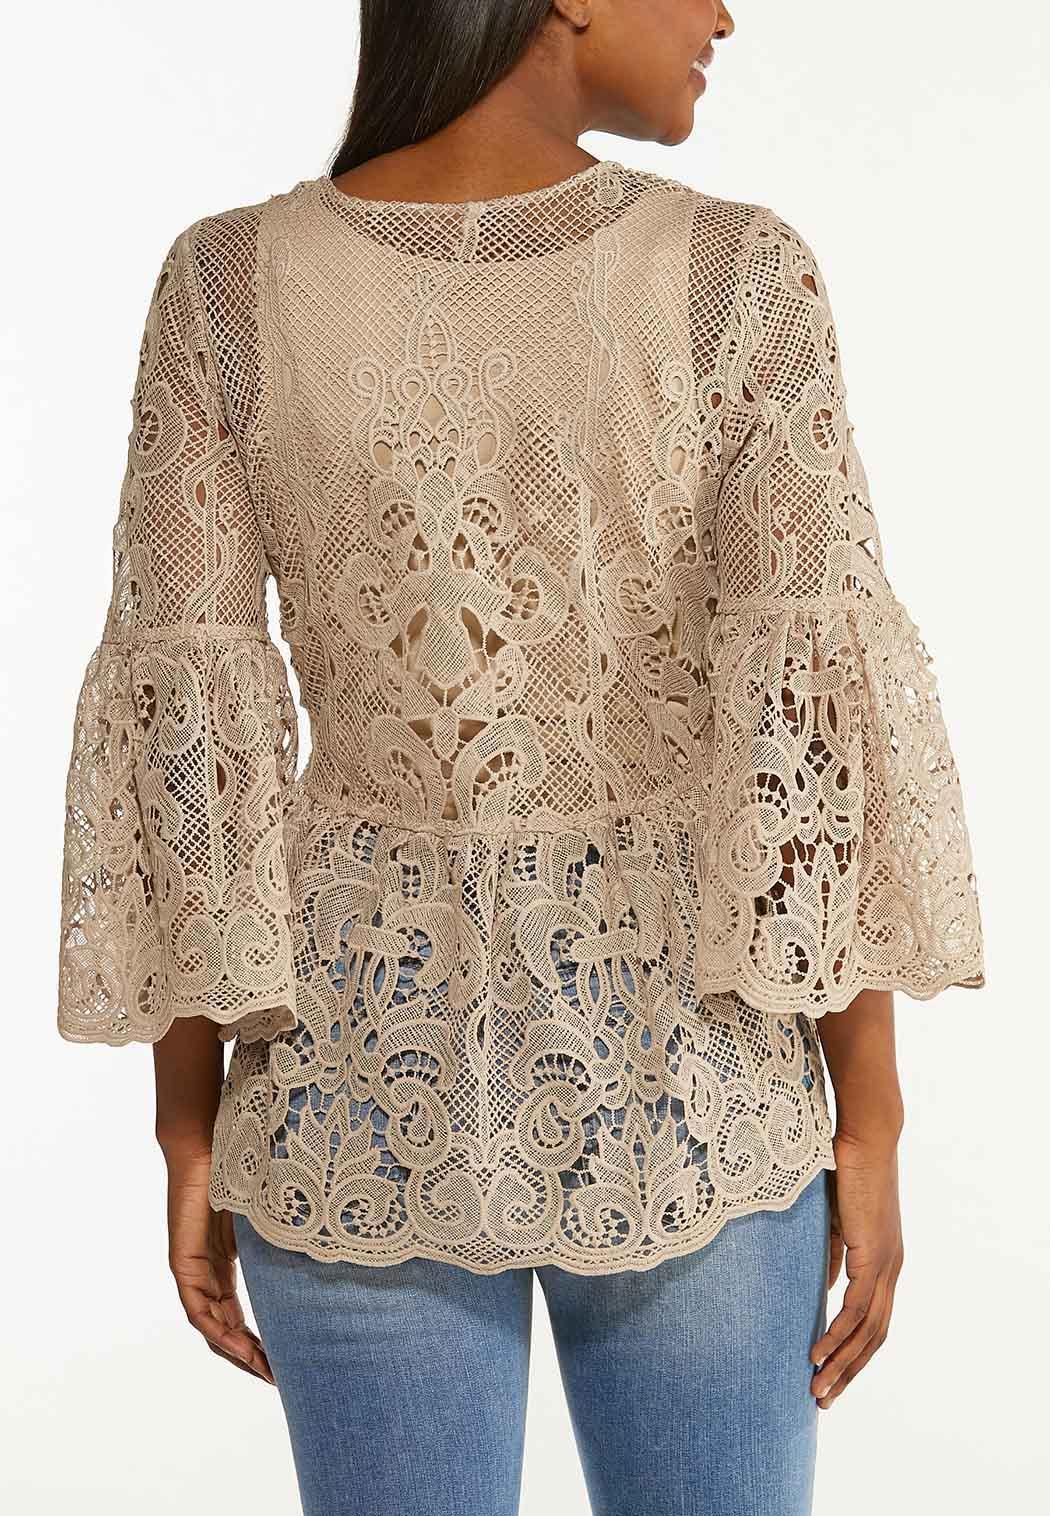 Plus Size Tan Crochet Peplum Top (Item #44509591)